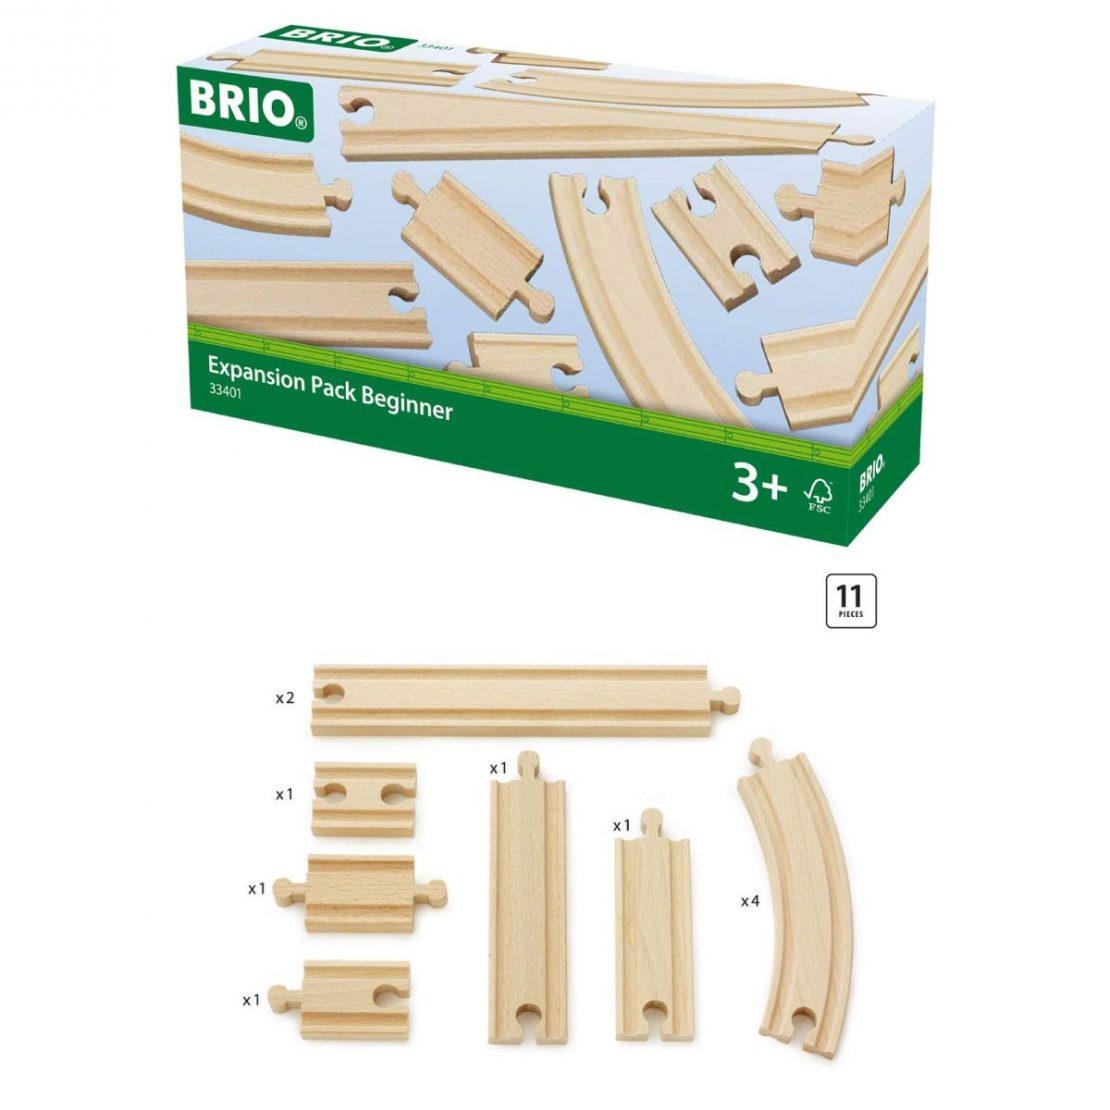 Brio Beginner Expansion Pack